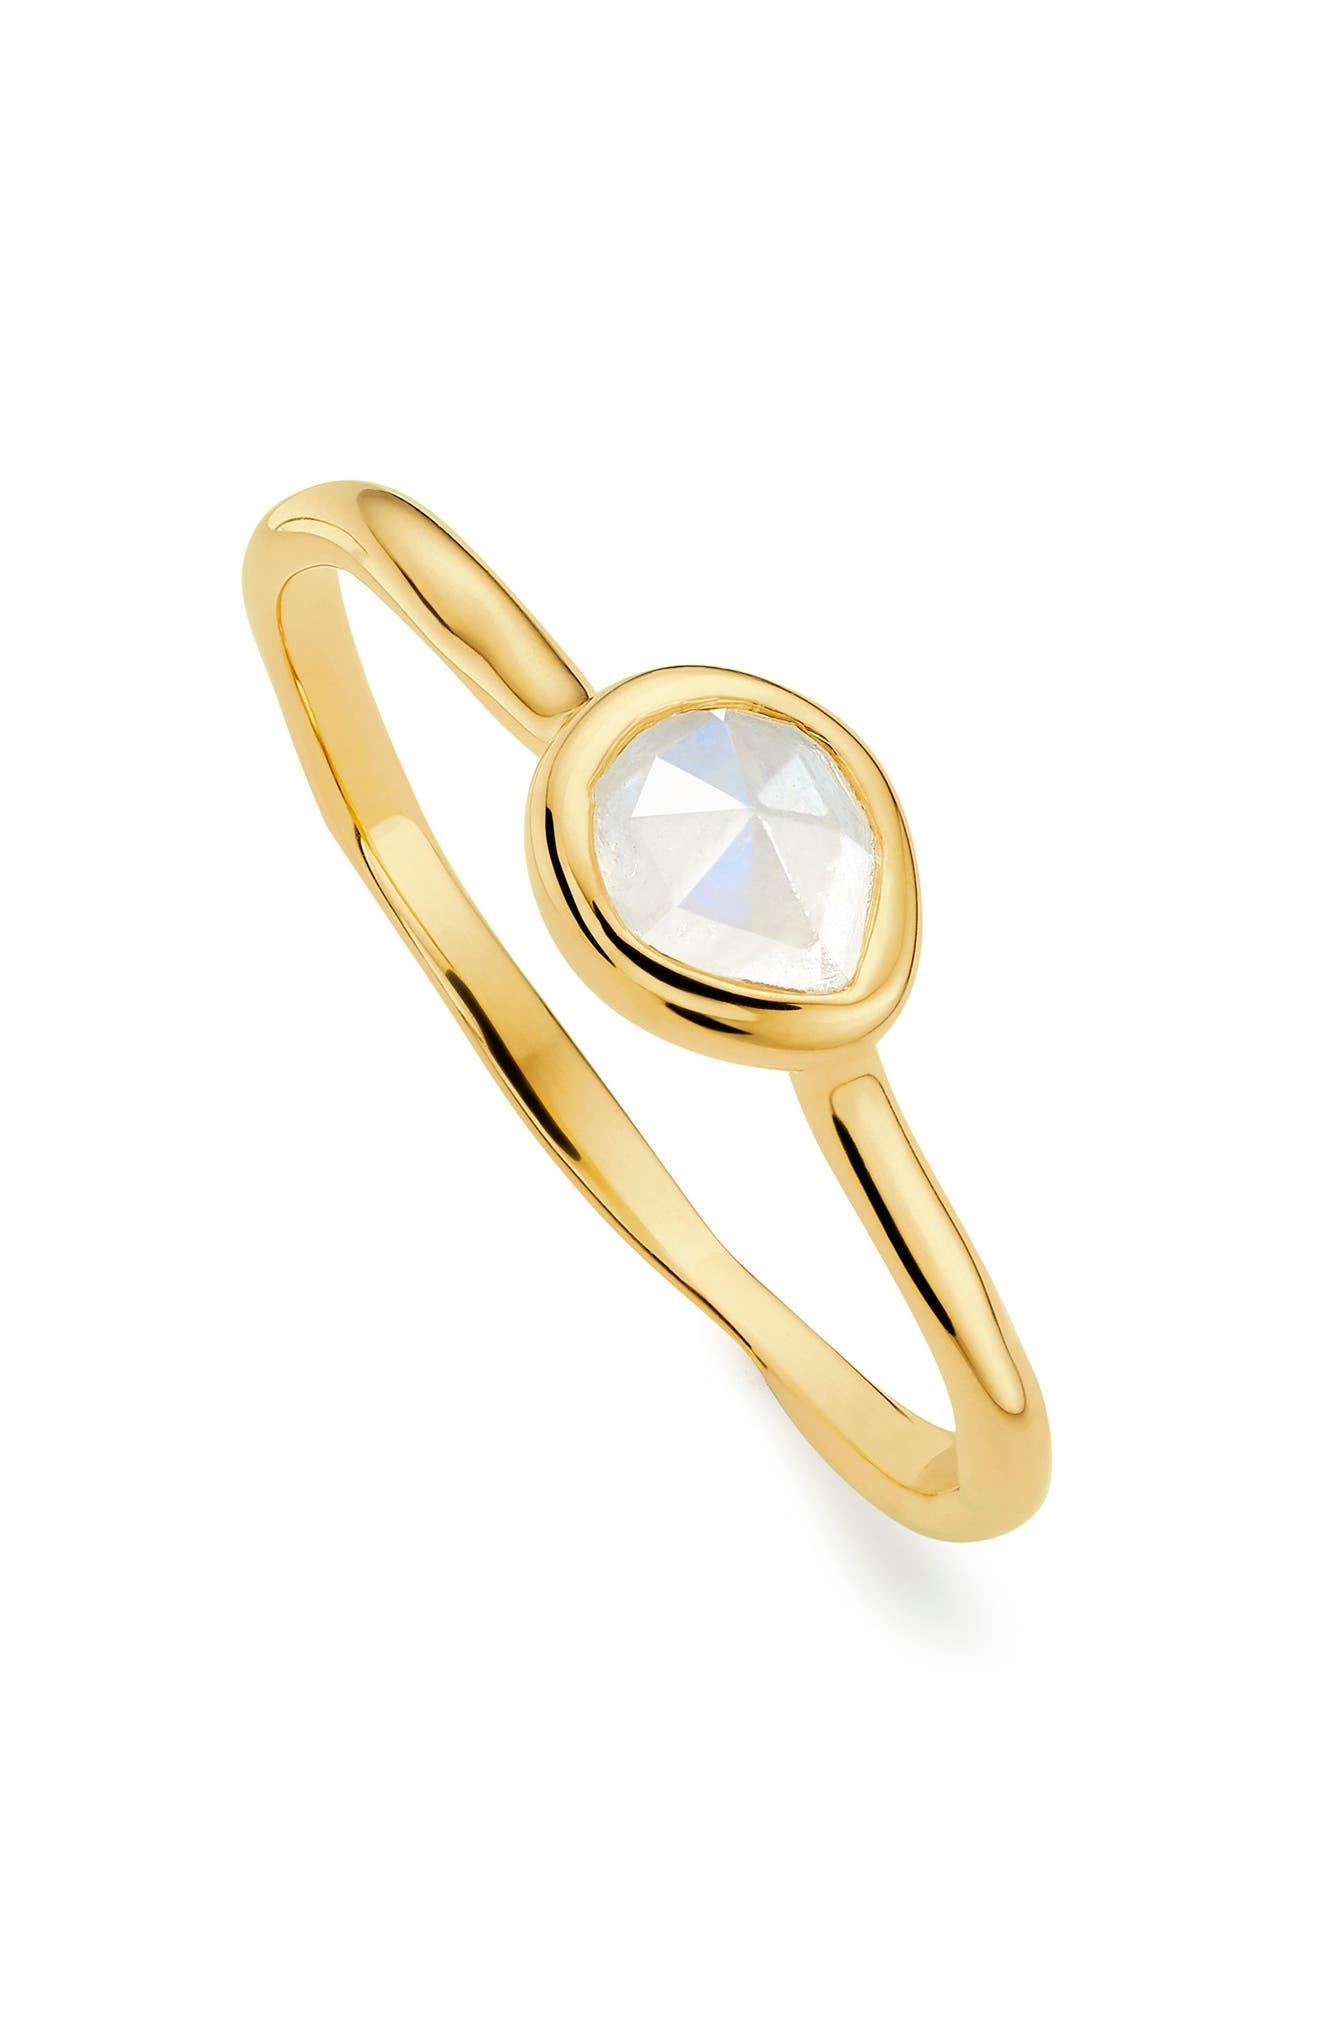 Siren Small Semiprecious Stone Stacking Ring,                             Alternate thumbnail 5, color,                             GOLD/ MOONSTONE